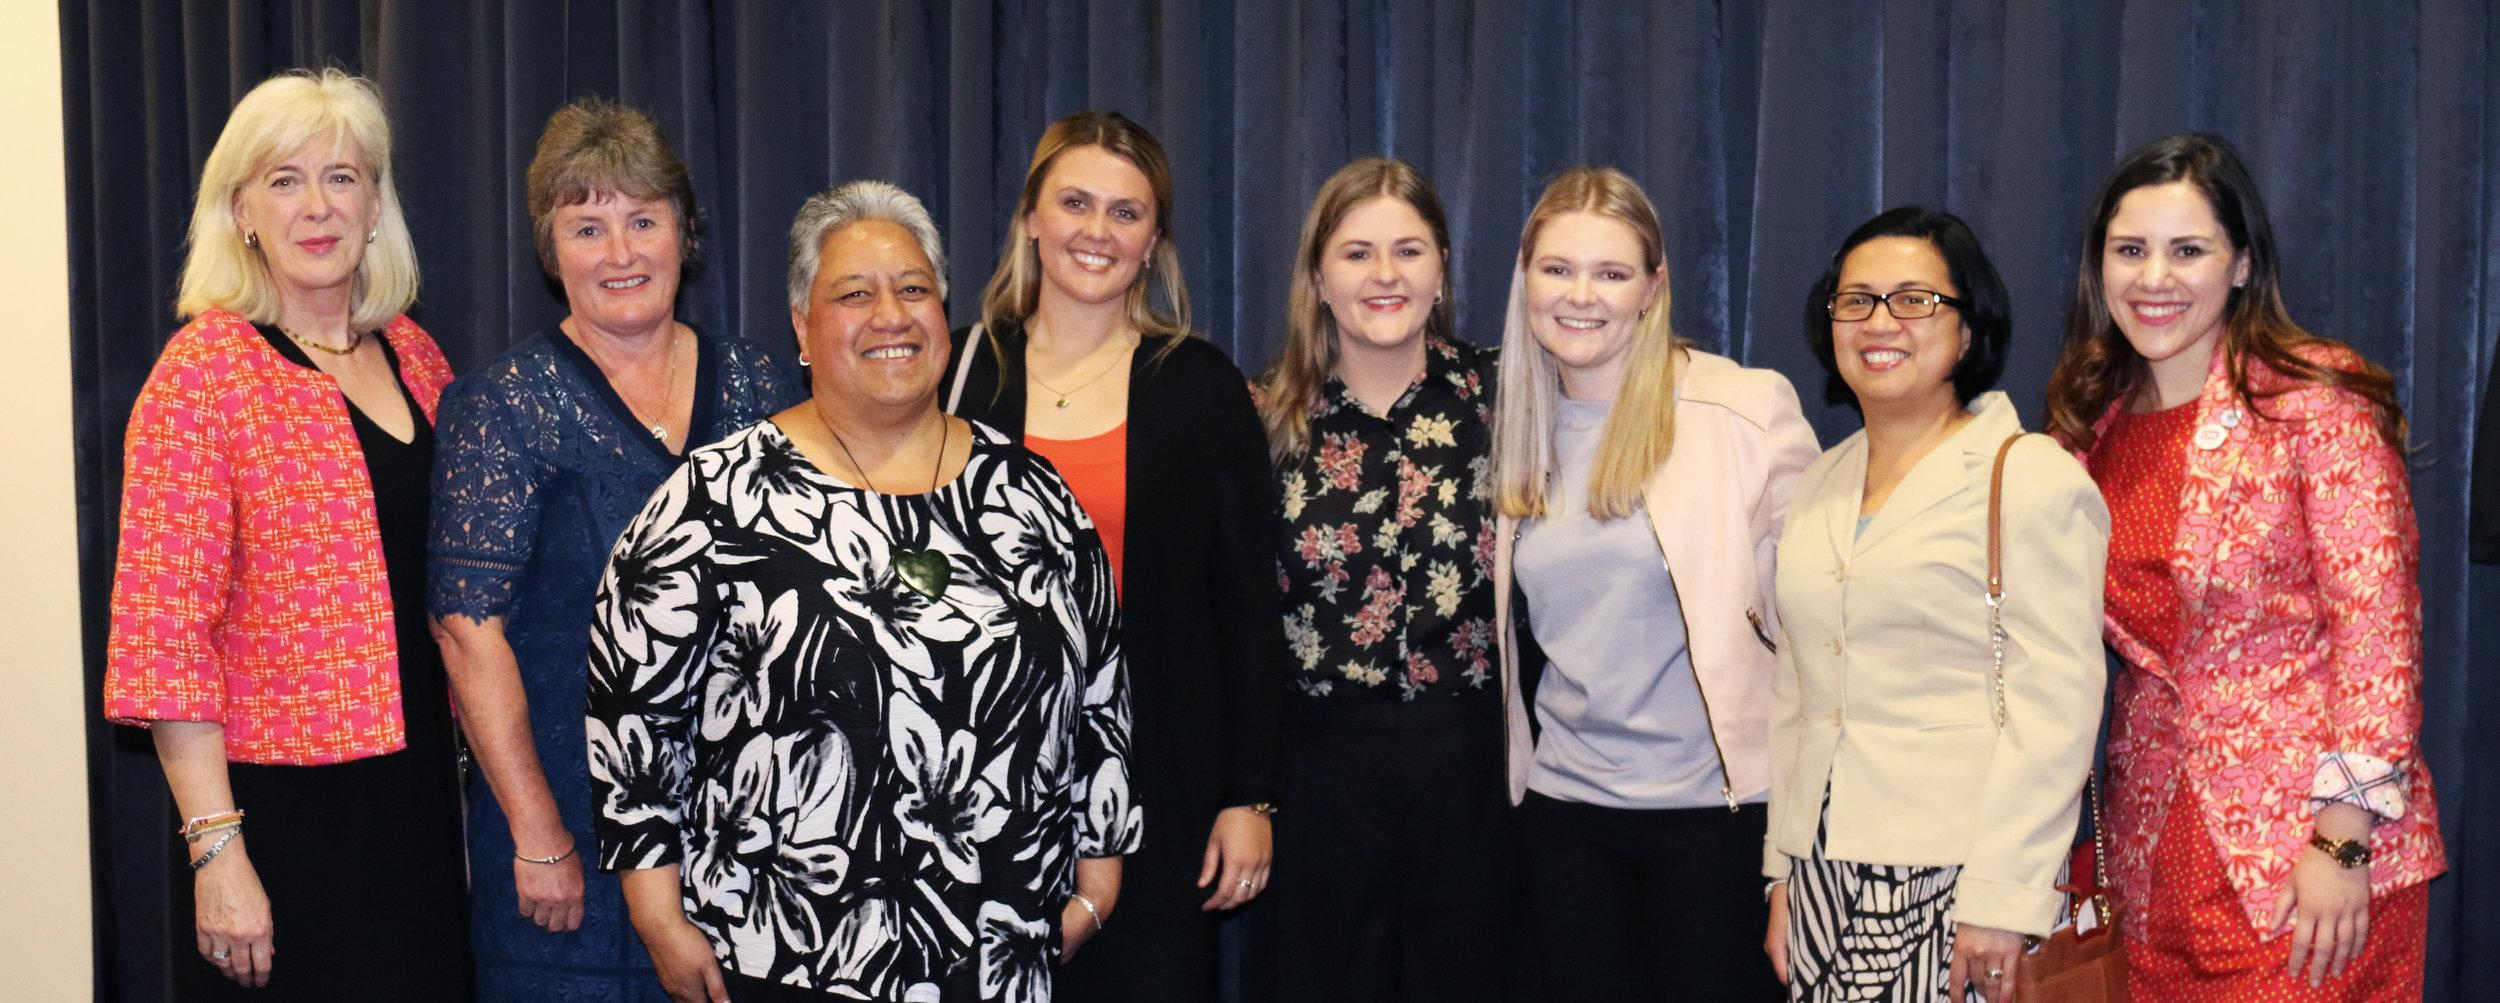 From left: Lucy Lloyd-barker, sally lee (past board member), jamie toko, jaime mcfie, brittany oliver (past board member), charlotte muggeridge, marilyn castillo and kimberley kilgour.